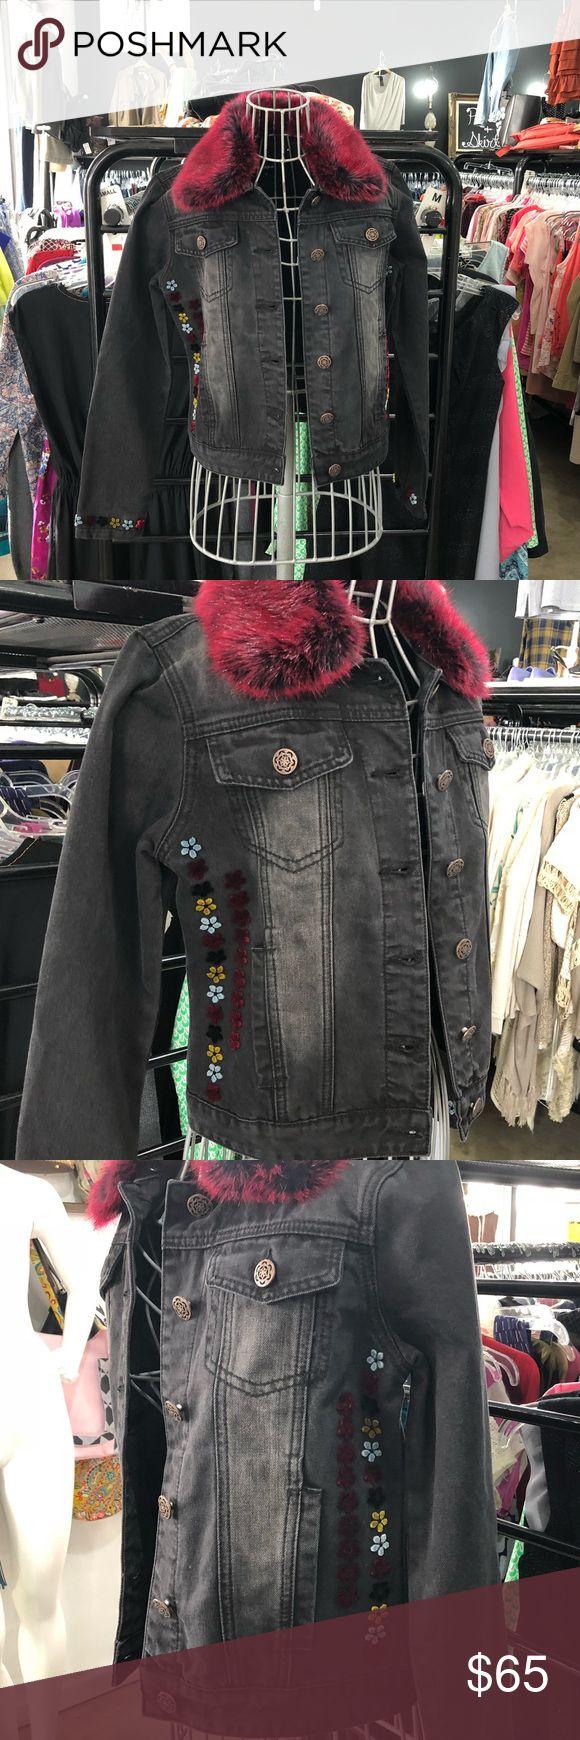 Desigual Fur Collared Embroidered Denim Jacket Desigual jacket Desigual Jackets & Coats Jean Jackets